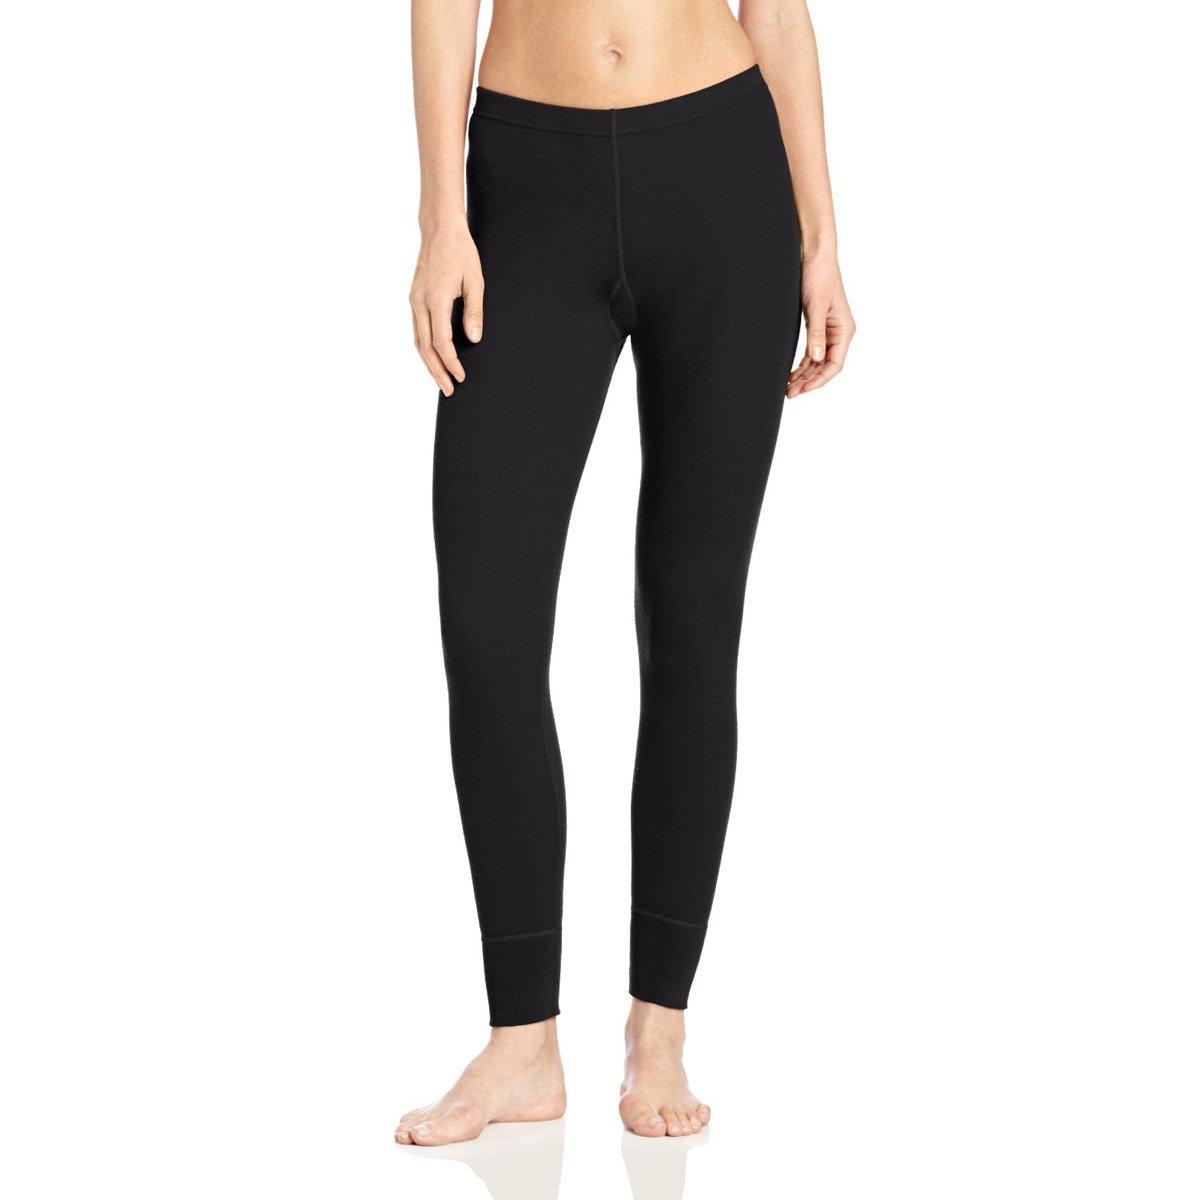 Minus33 100% Merino Wool Base Layer Midweight Black Bottoms (Small) by Minus33 Merino Wool